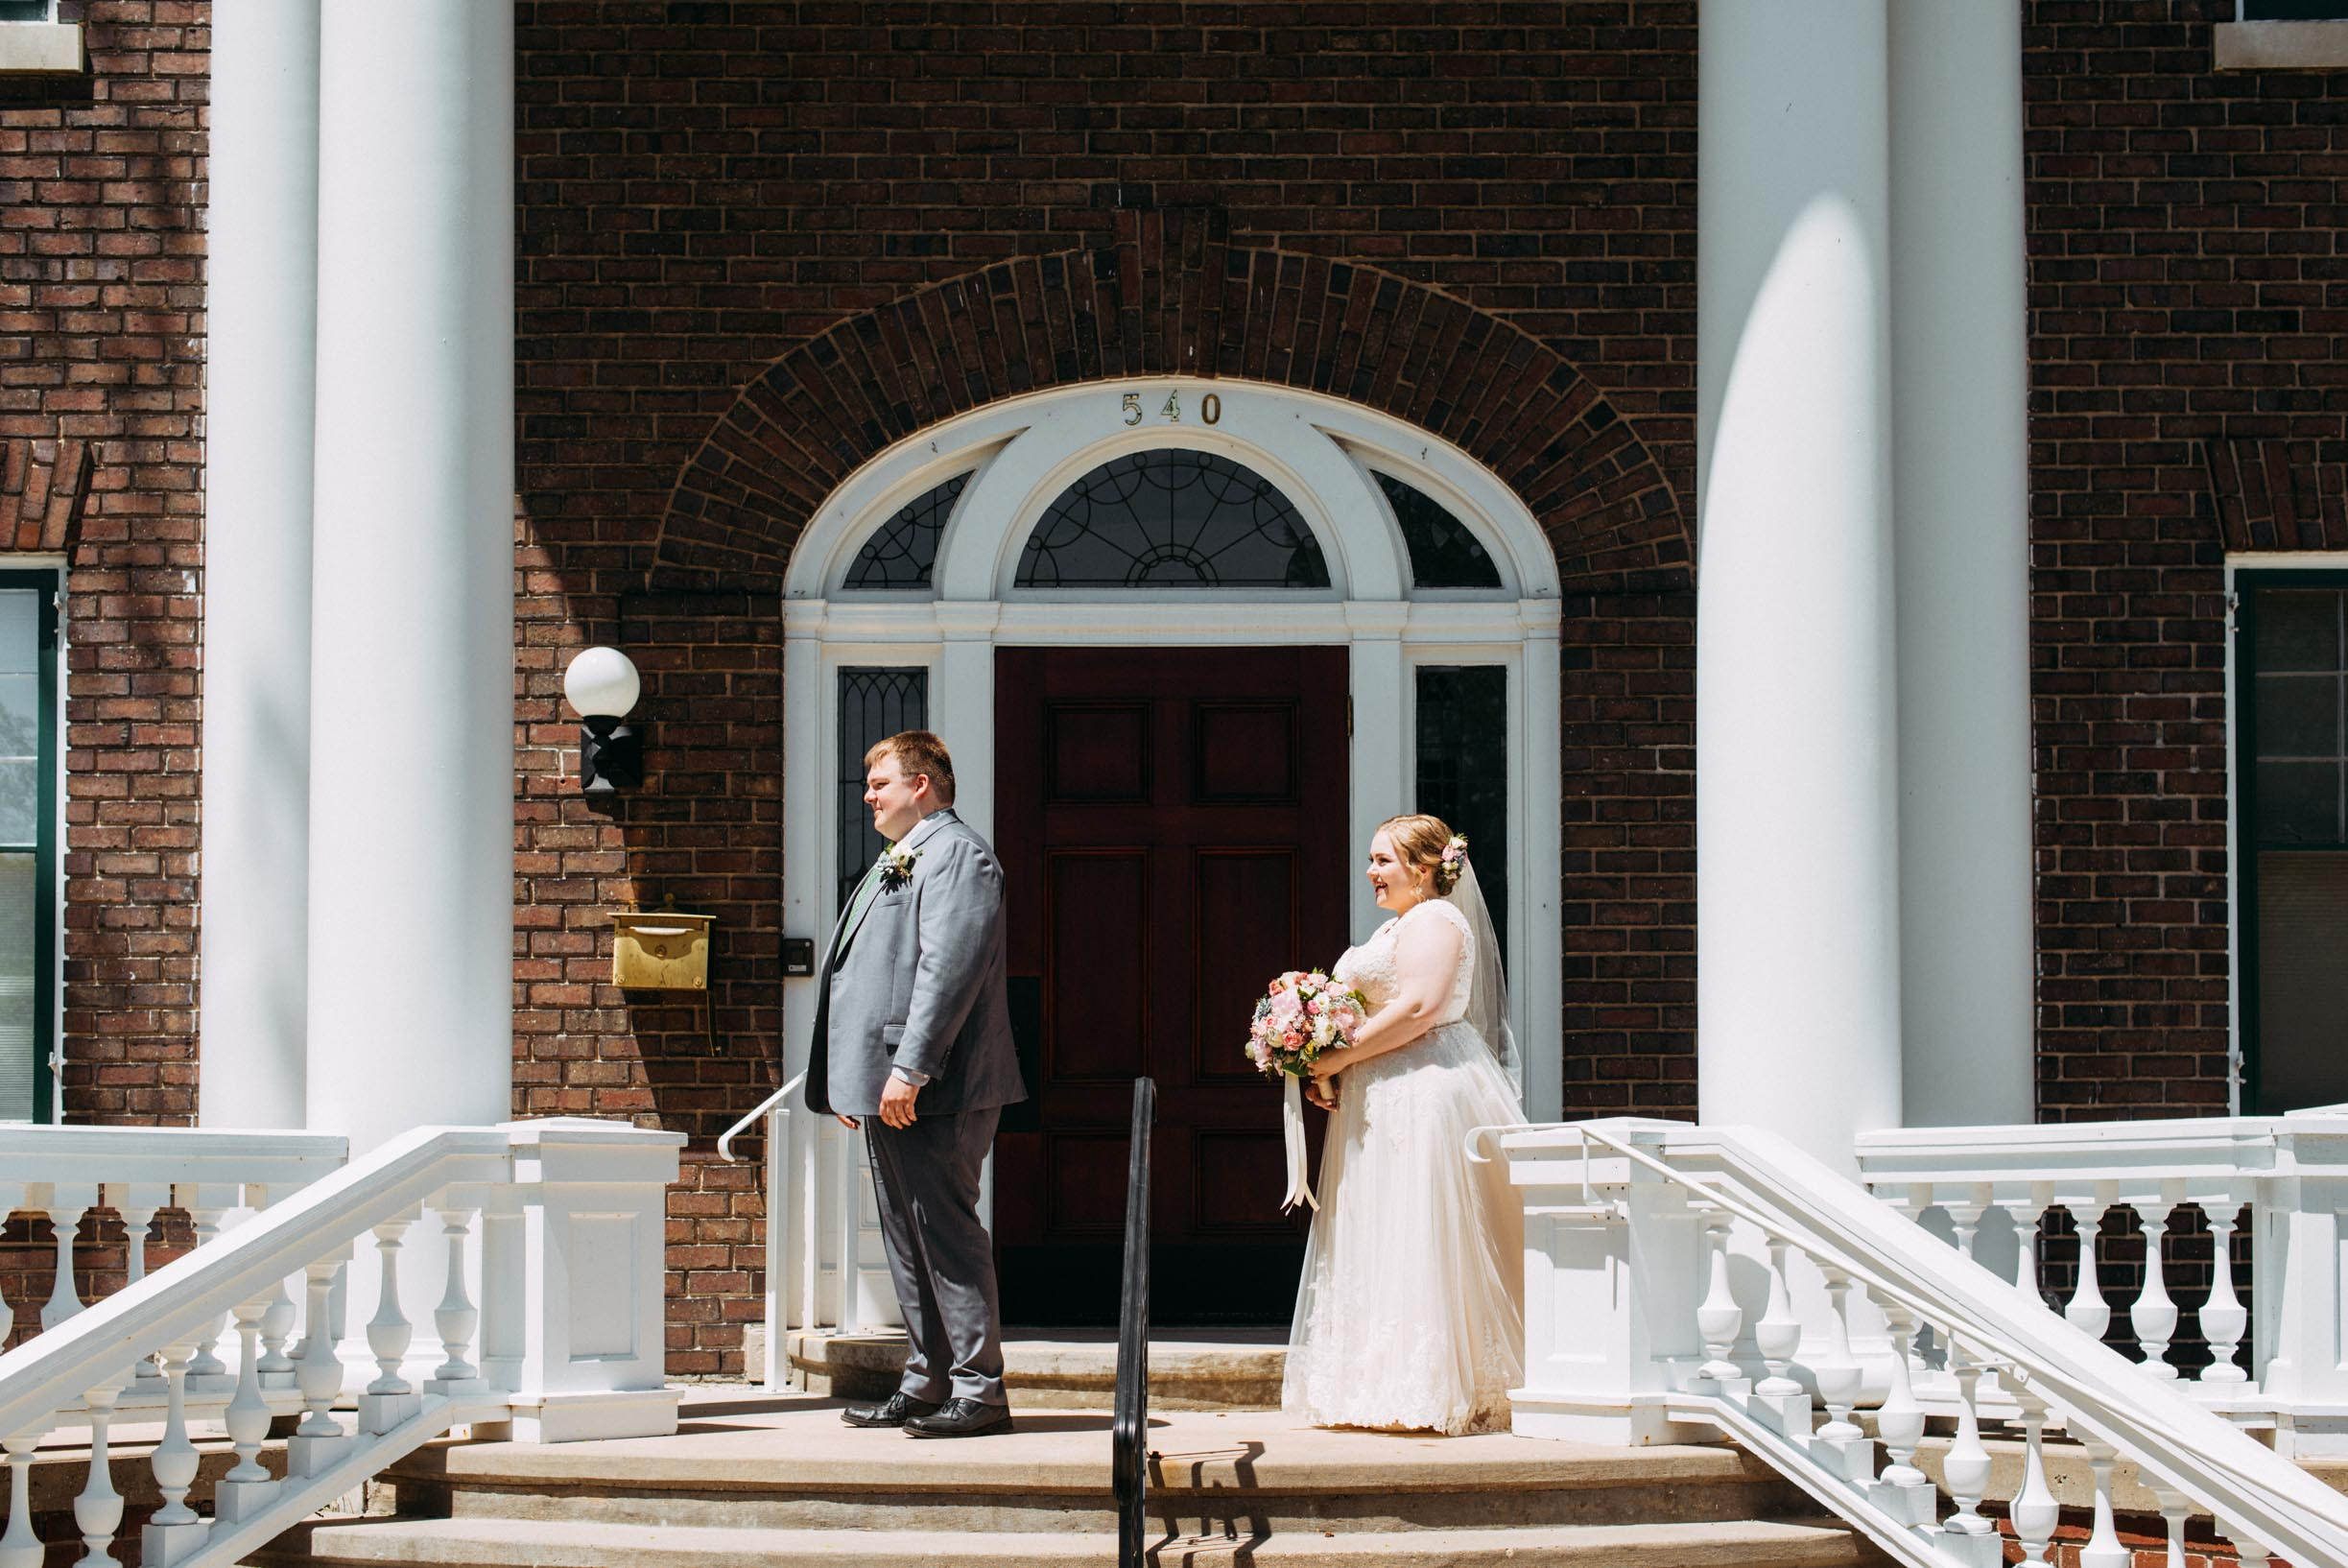 Hannah_Brandon_Wisconsin_Wedding_First_Look-10.jpg